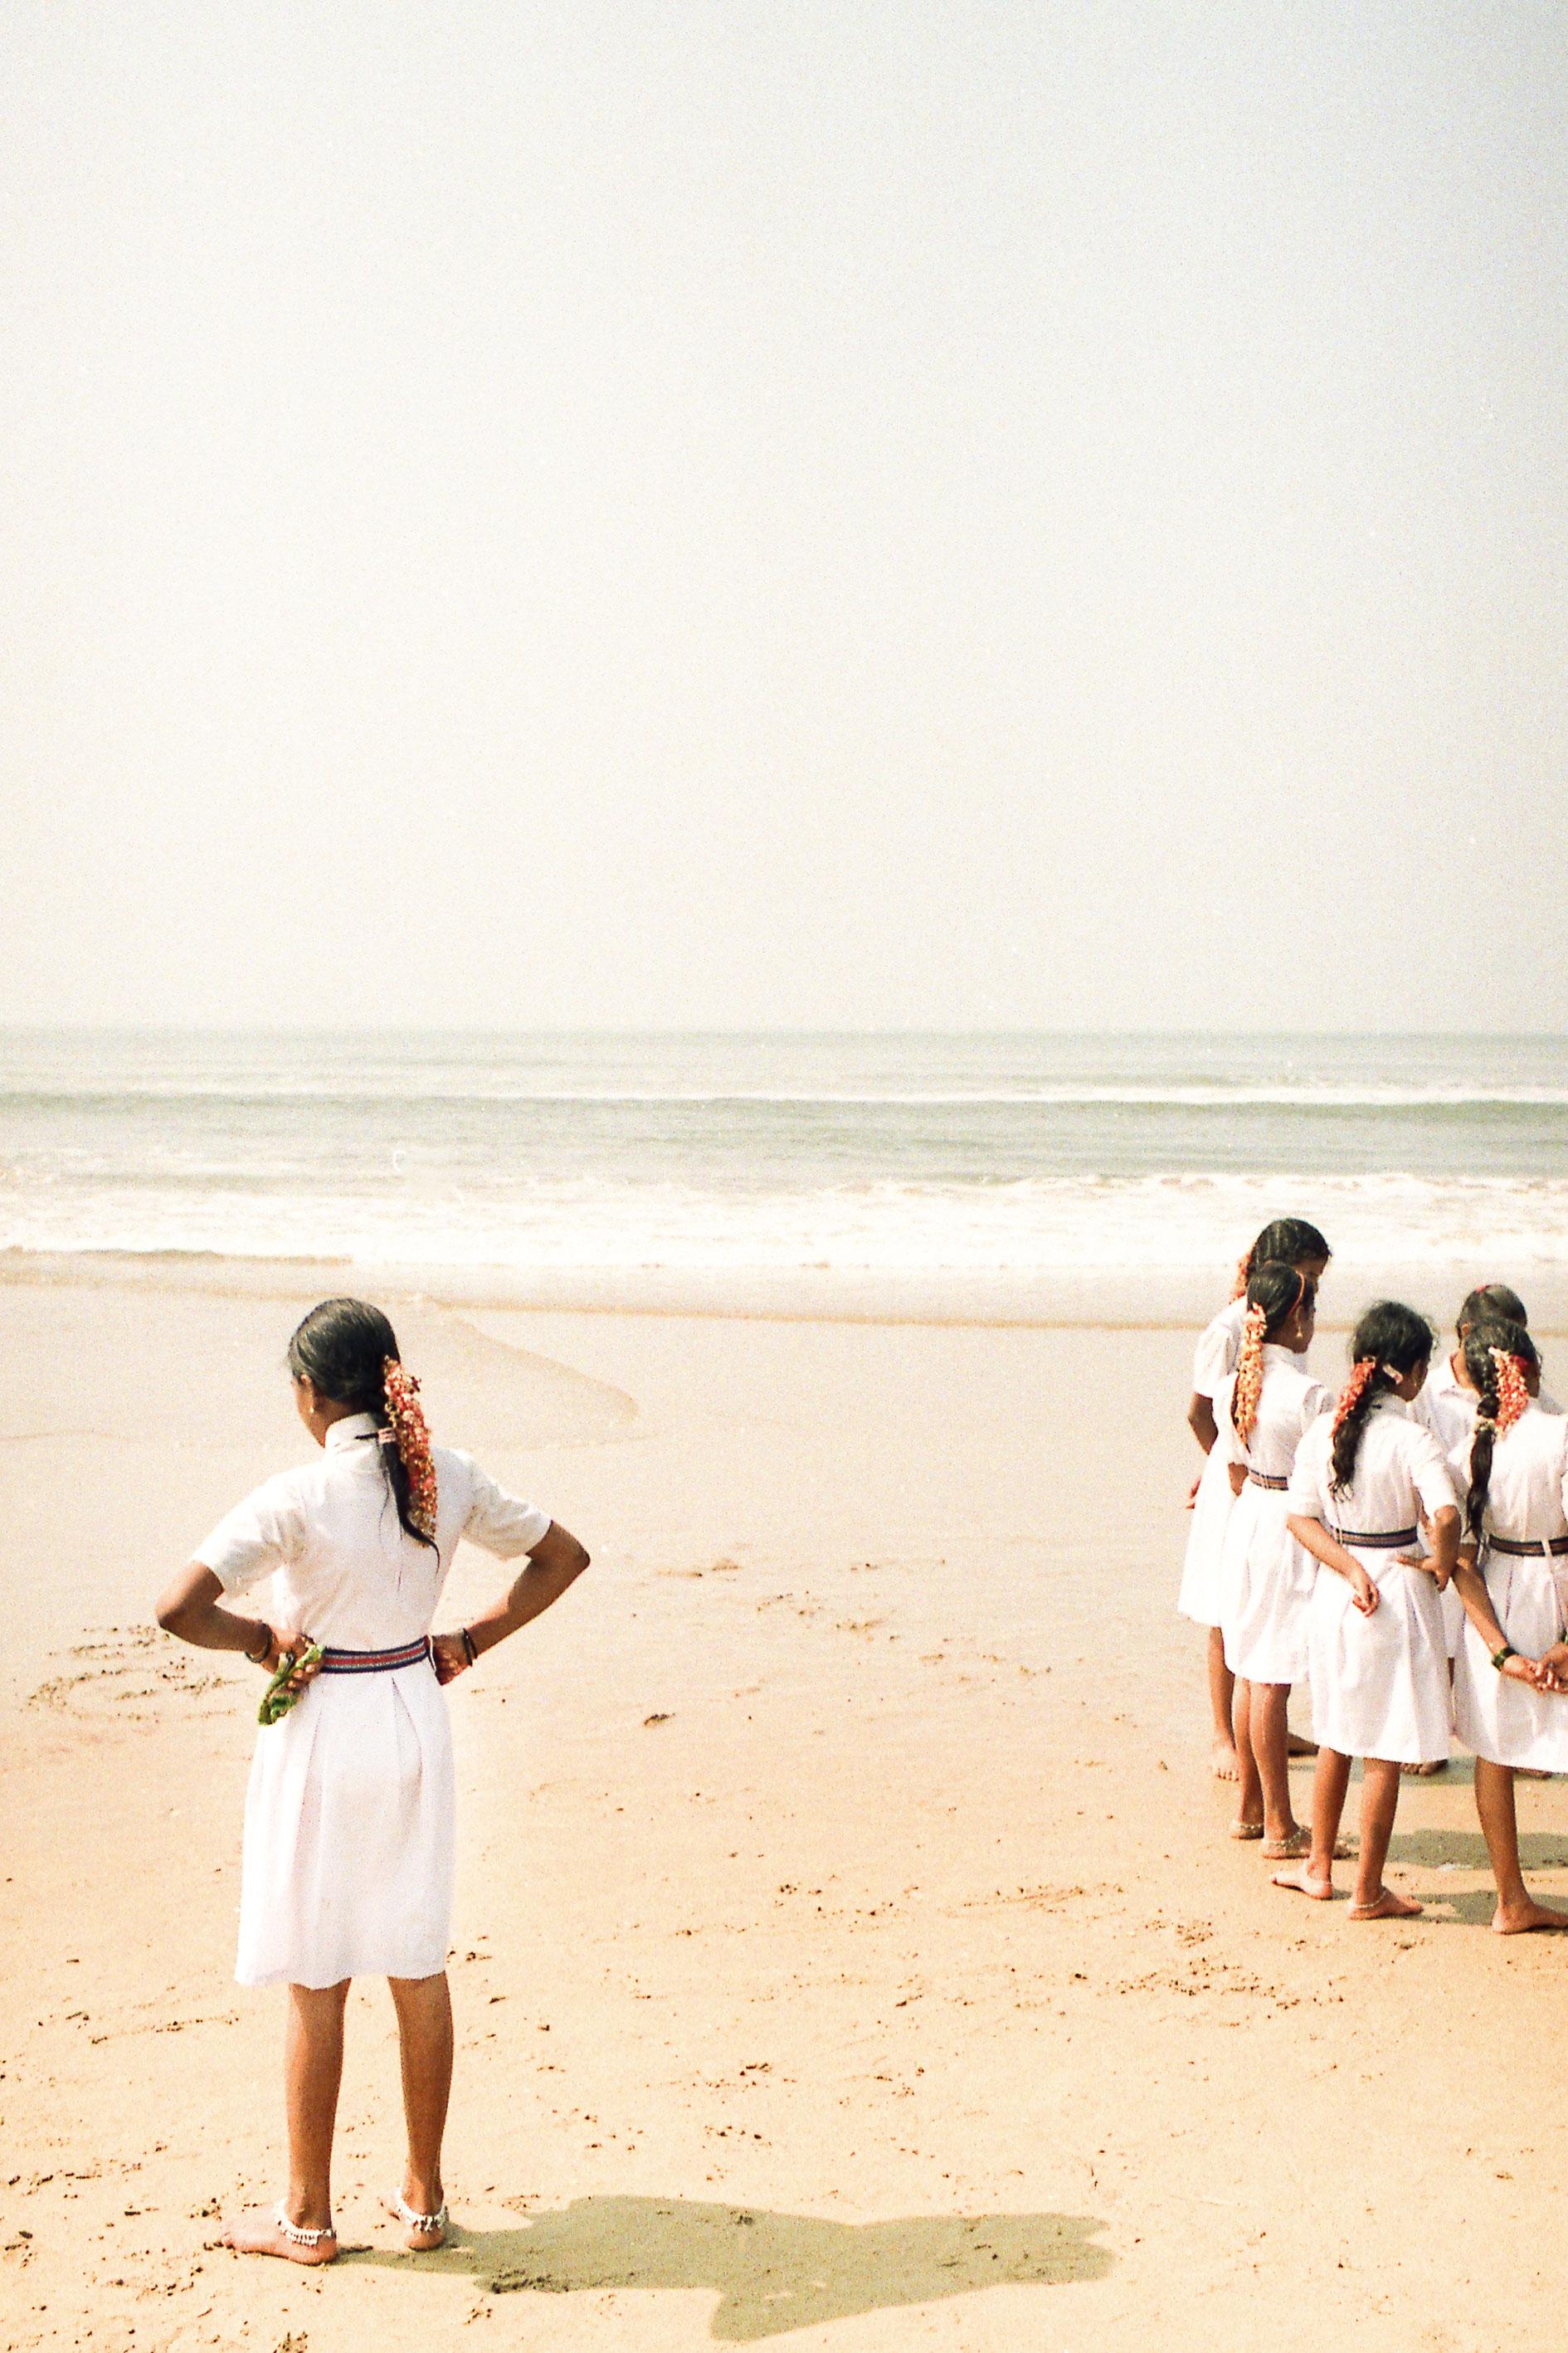 Girls, Gokarna, Karnataka,India, Incredible india, analog photography, shooting film, fine art photography, fine art, project, India, travel photography